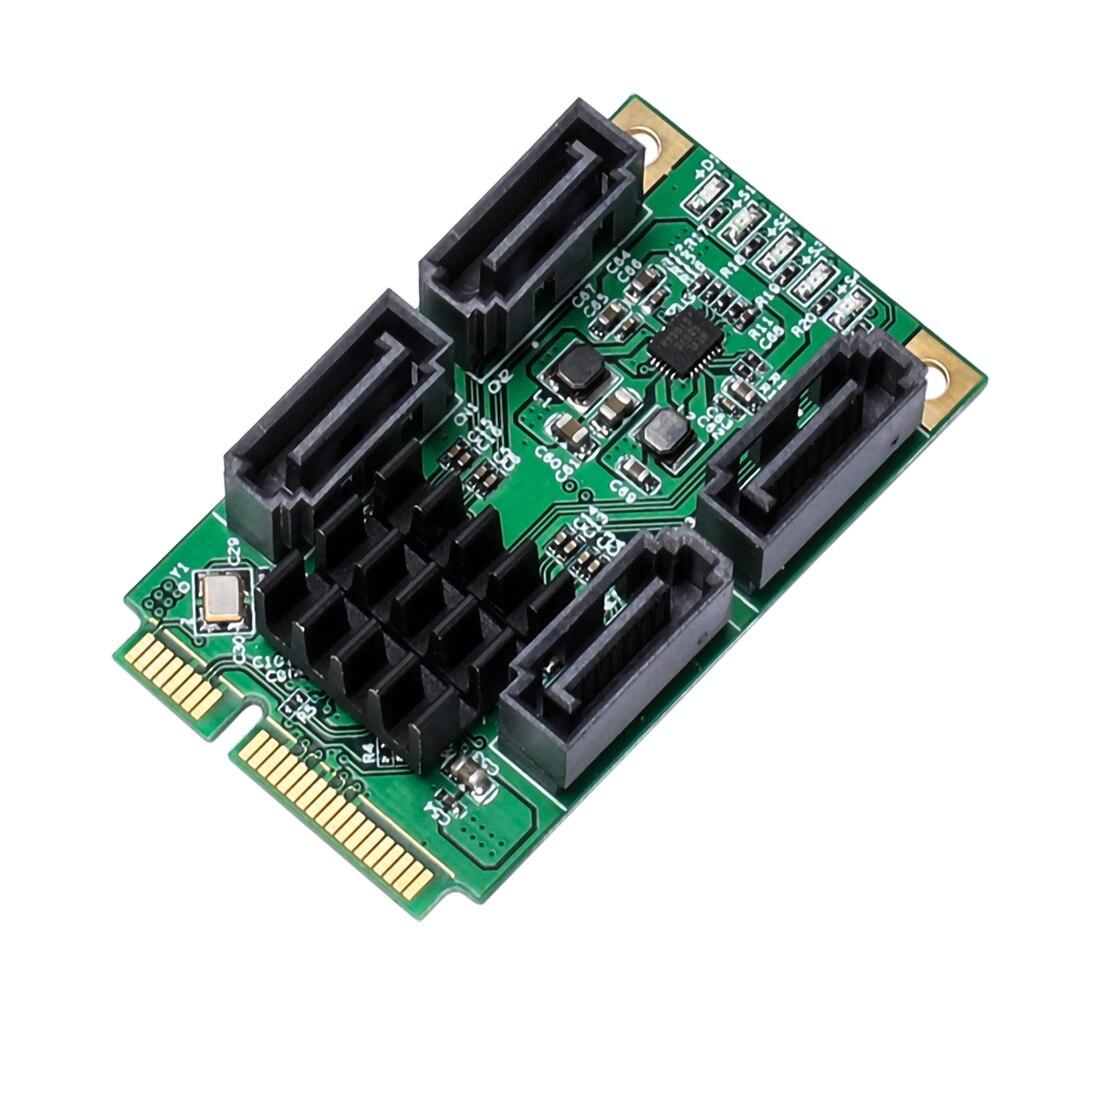 XT-XINTE Mini PCIE 4 Ports SATA III pci-express carte contrôleur SATA 3.0 Mini PCI-E disque dur SSD adaptateur carte d'extension - 5